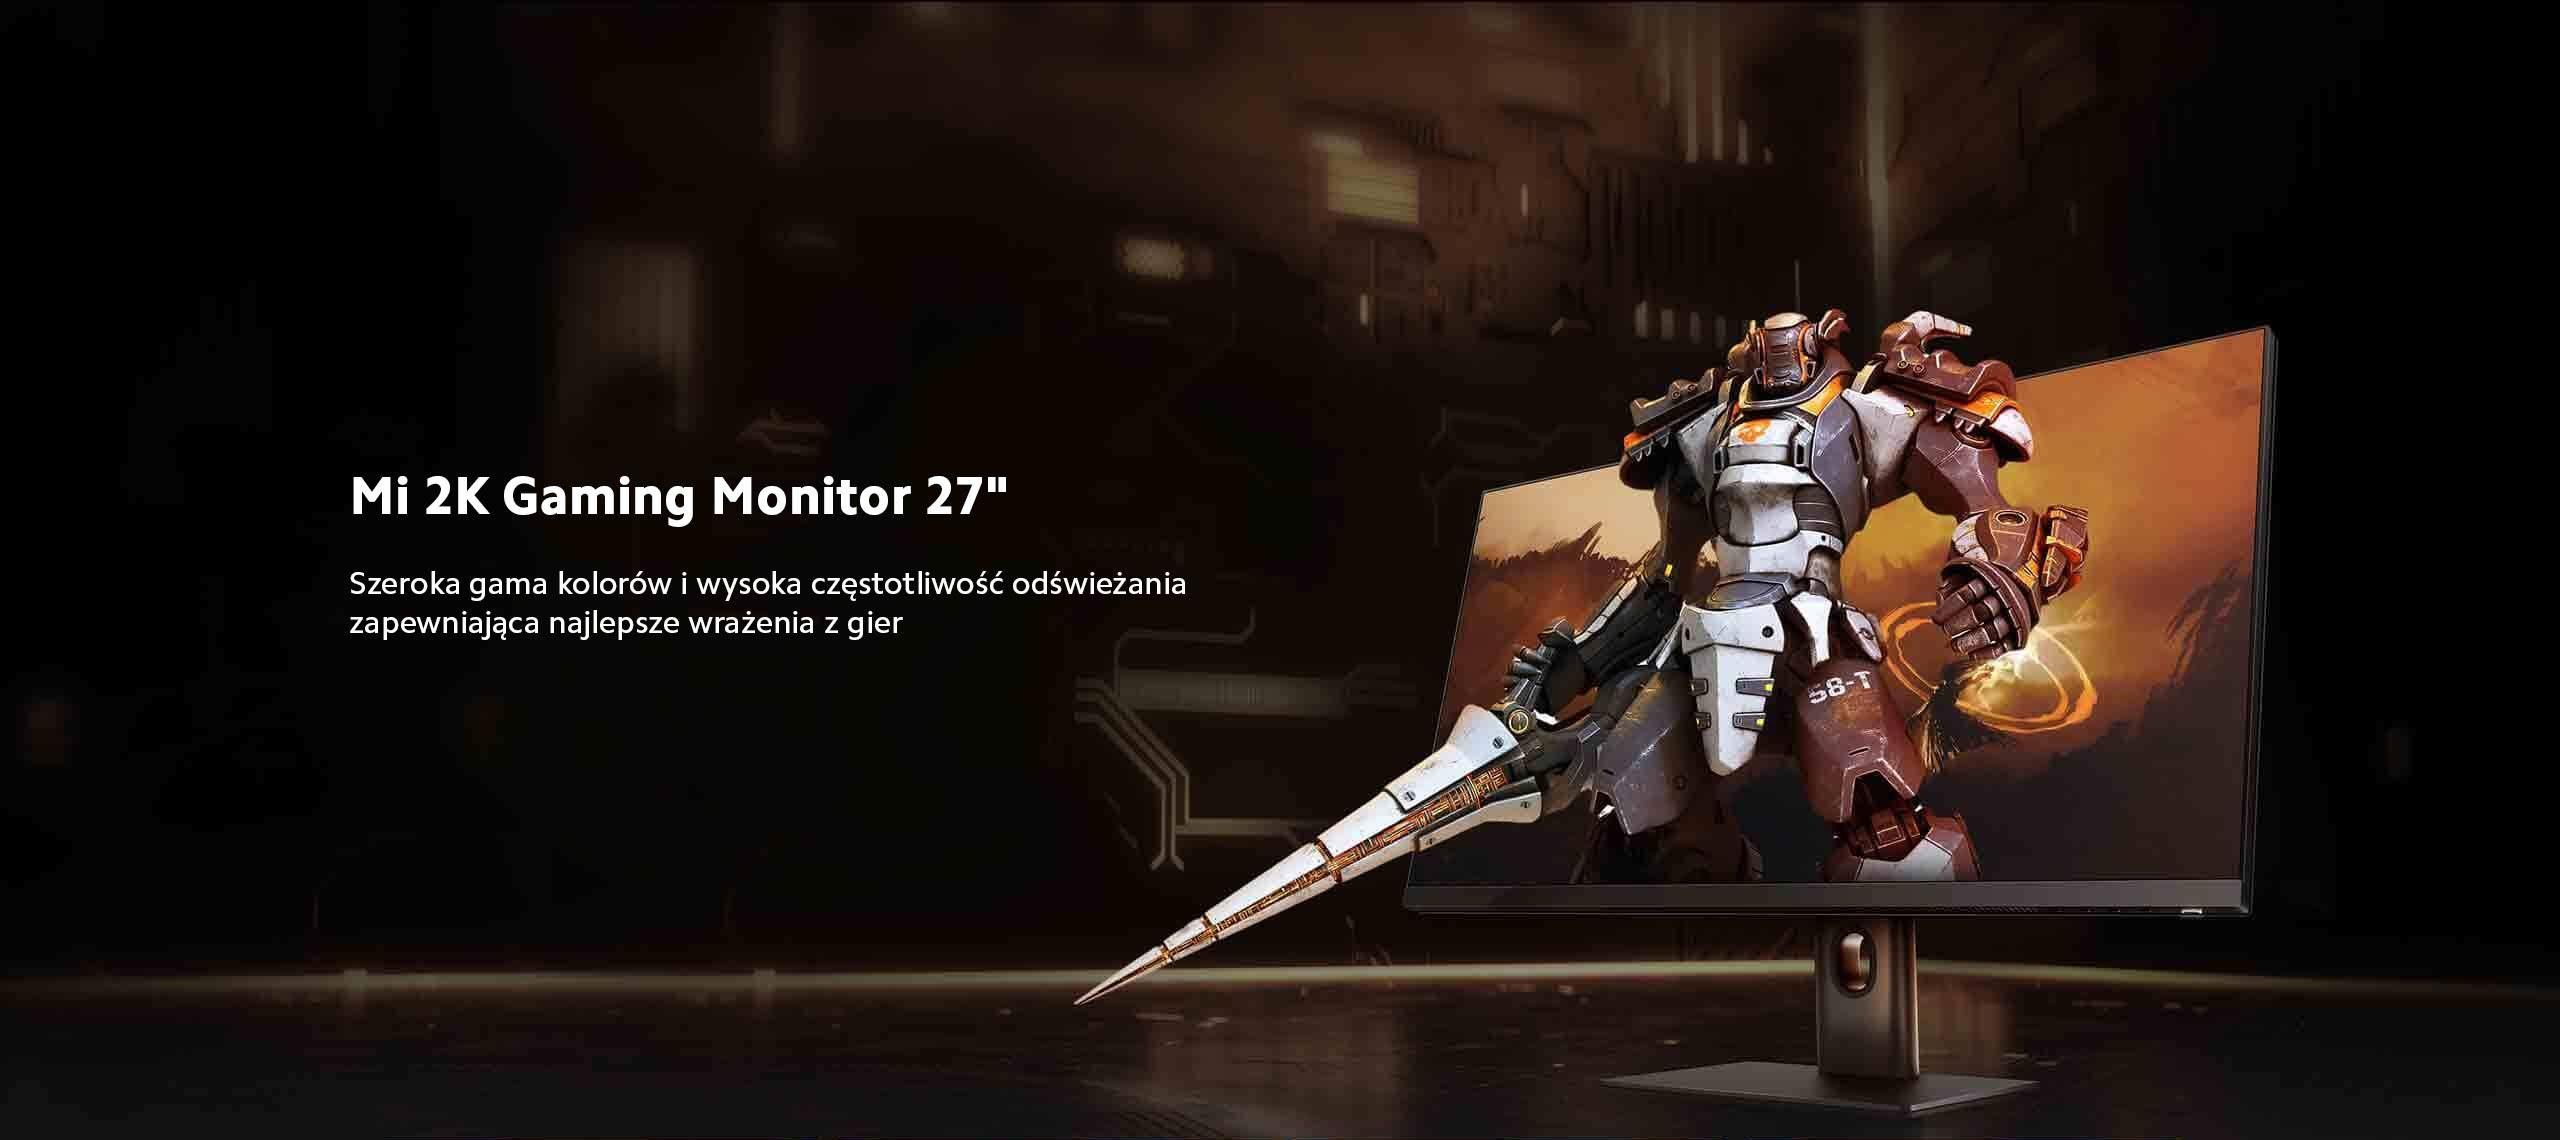 Xiaomi Mi 2K Gaming Monitor 27 inch monitor